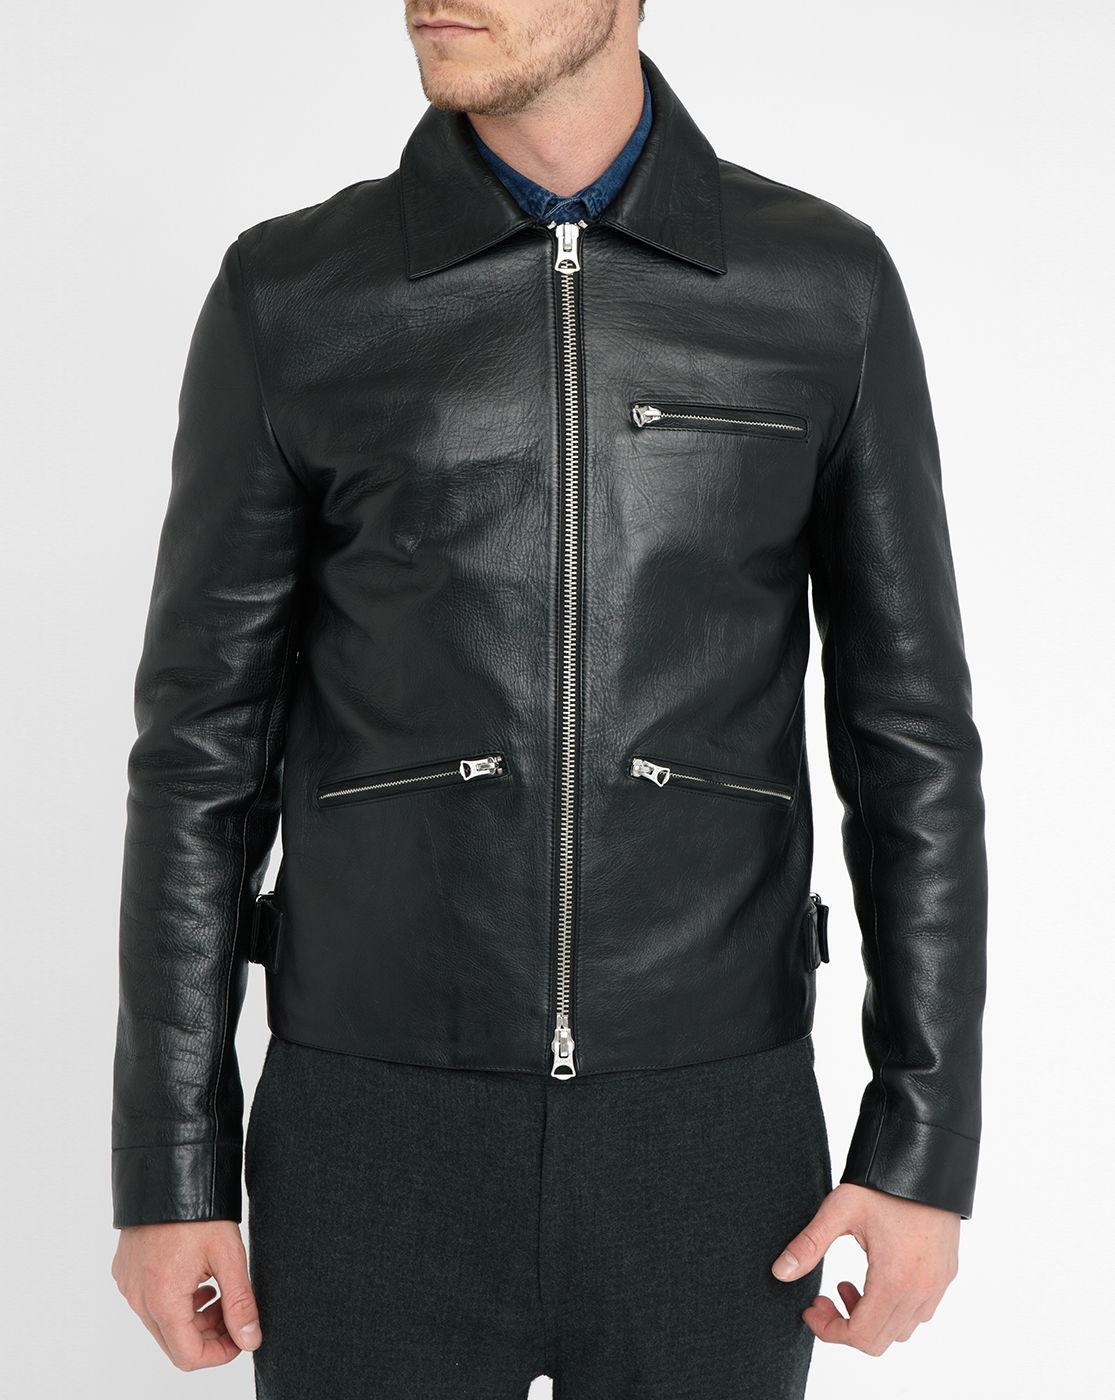 Acne Black August Leather Biker Jacket in Black for Men | Lyst